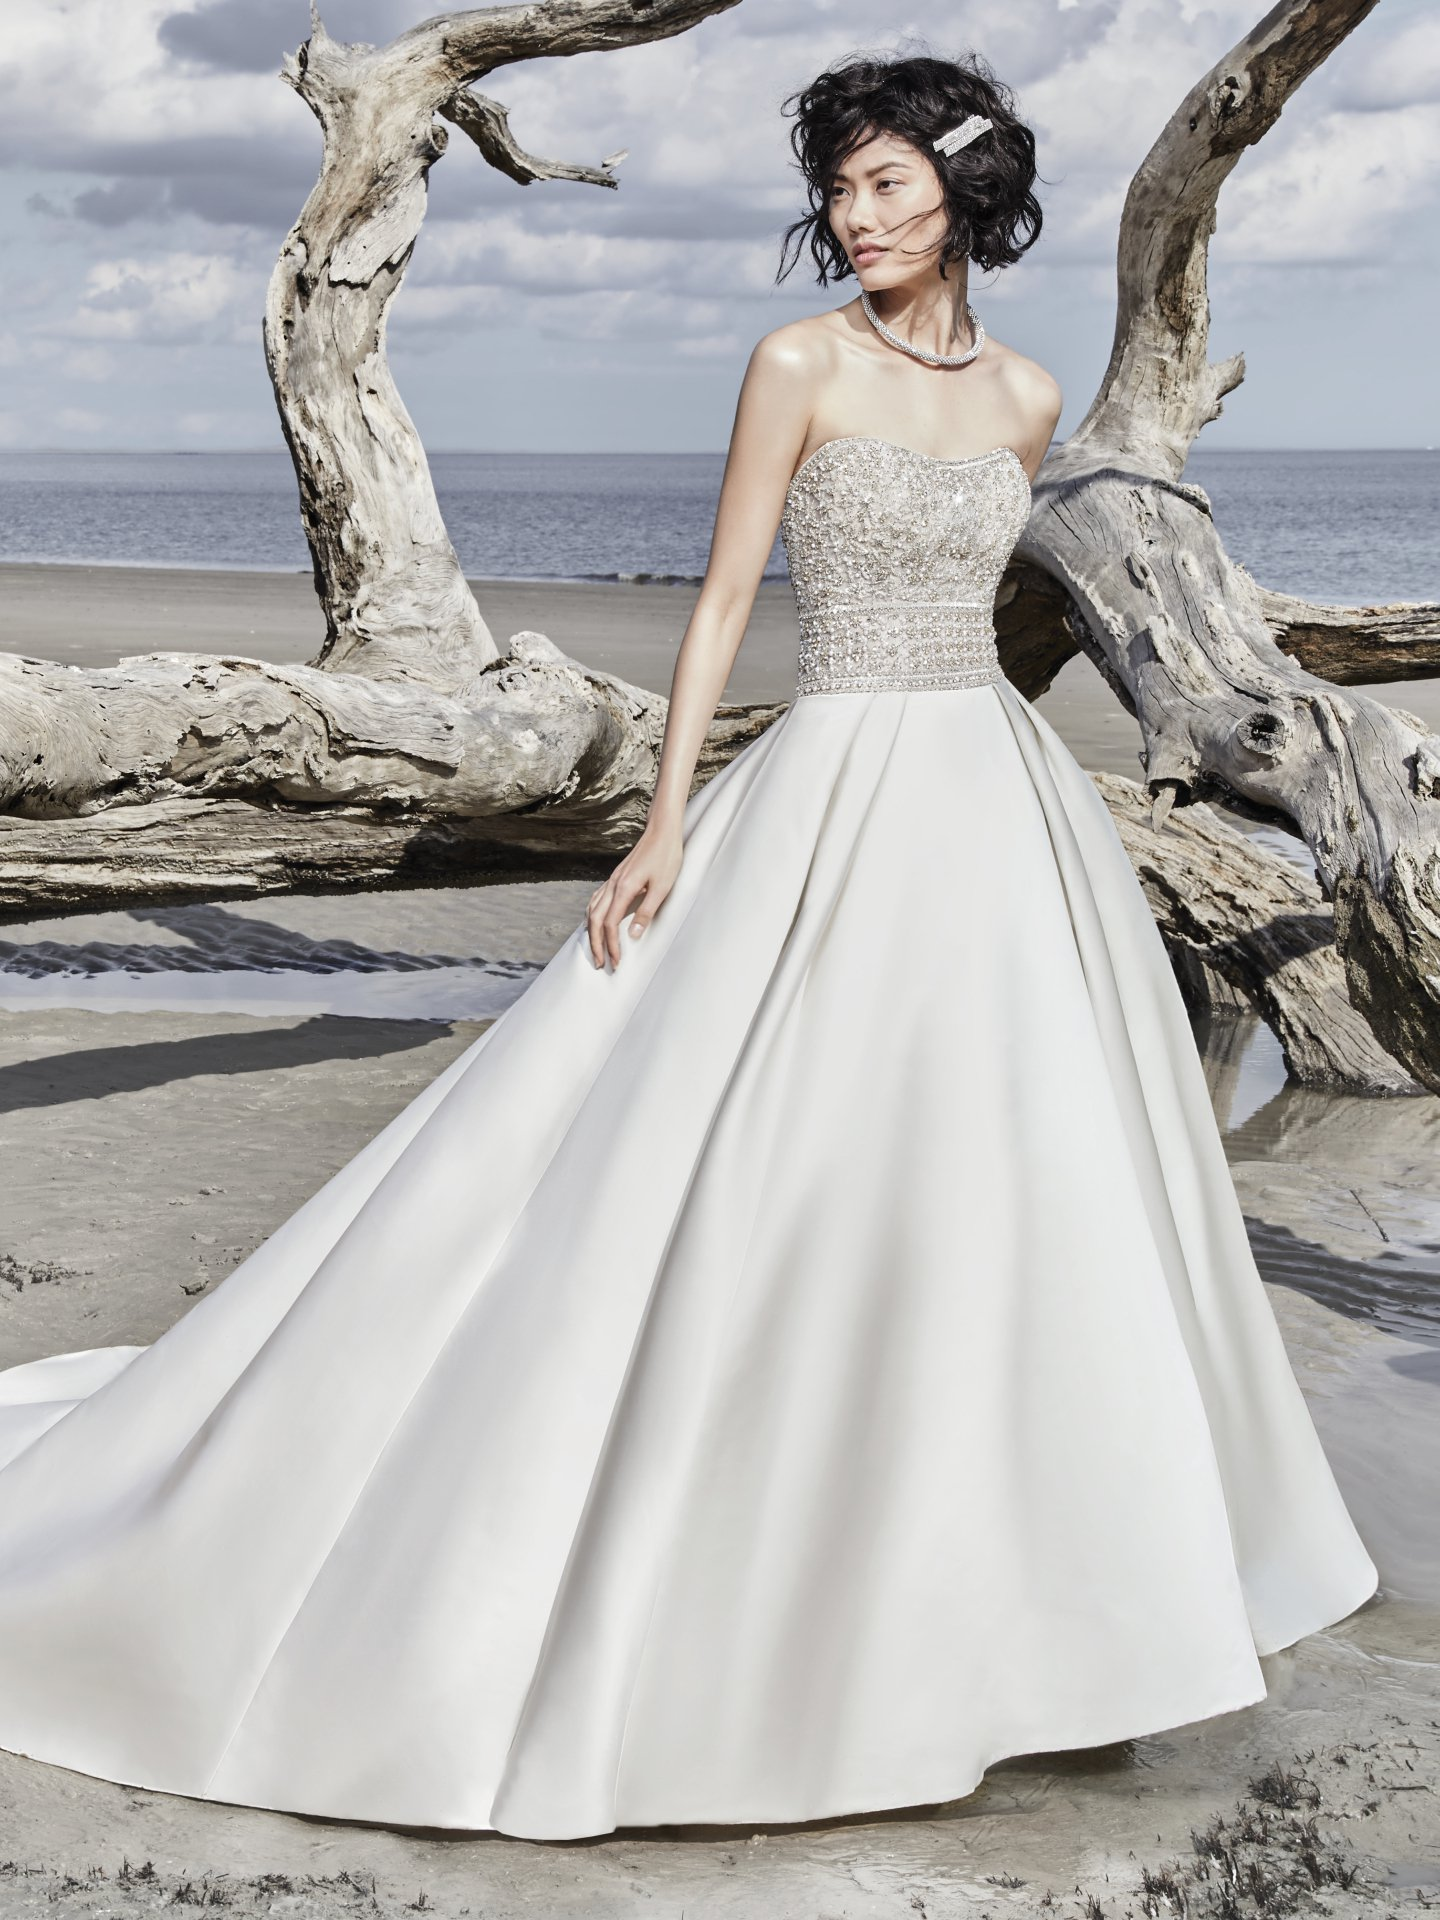 Strapless Sweetheart Sequin Bodice Satin Skirt Ballgown Wedding